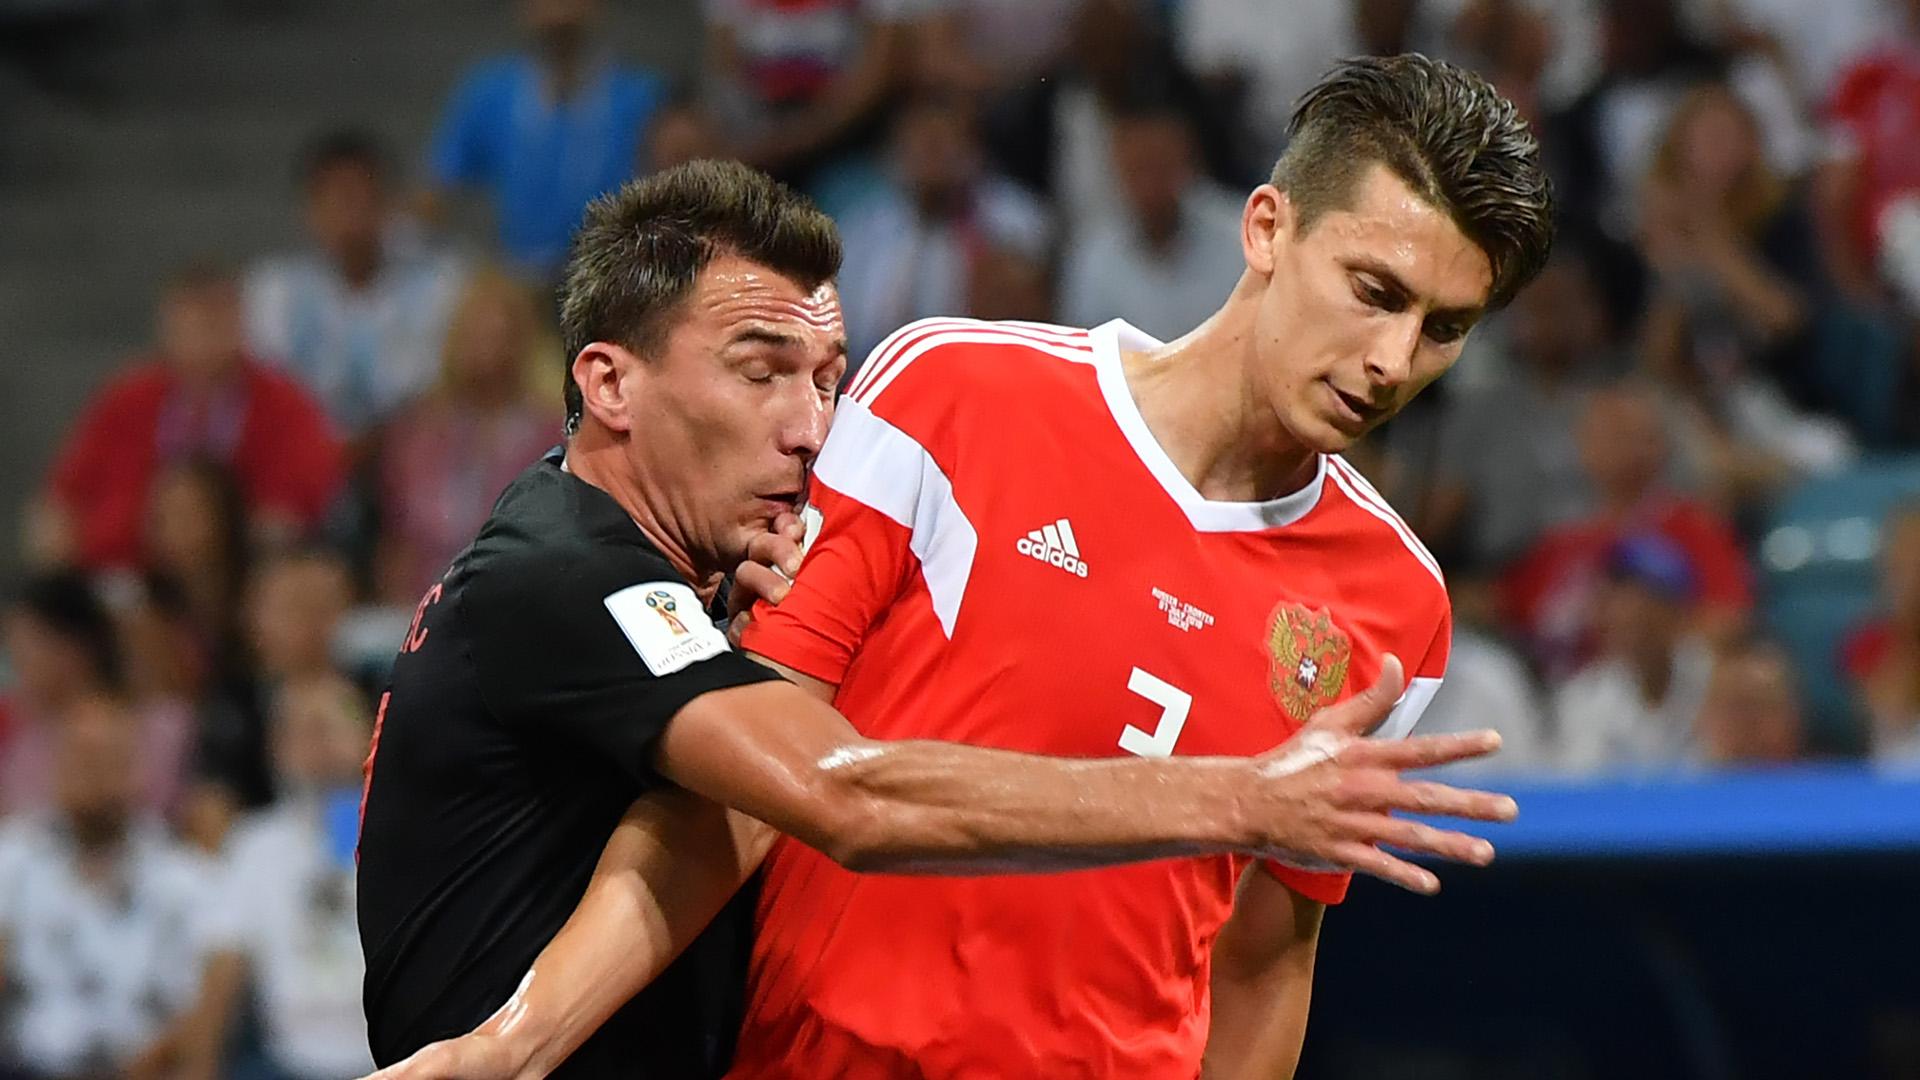 Mario Mandzukic Ilja Kutepov Russia Croatia World Cup 2018 070718